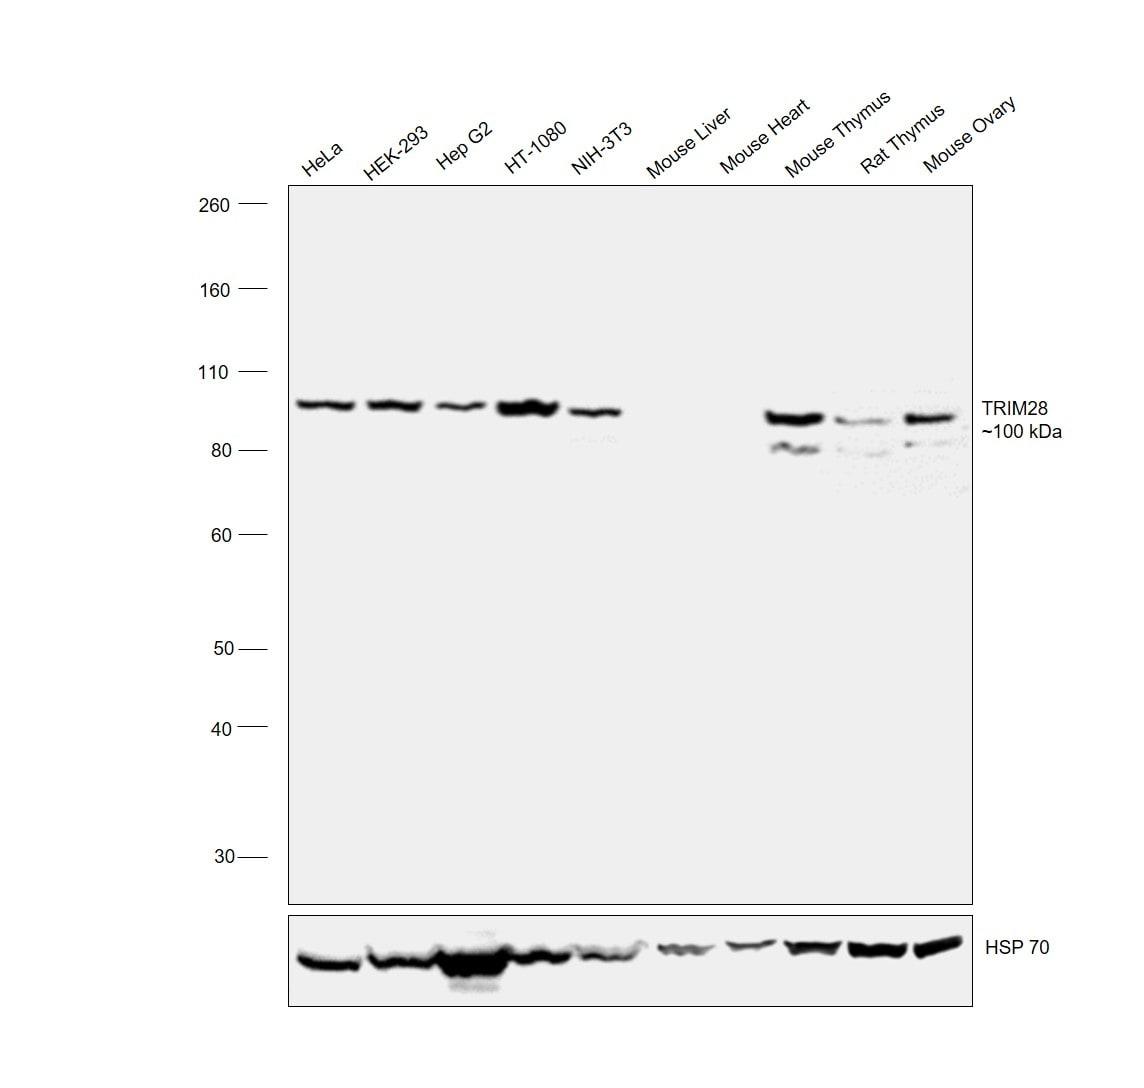 TRIM28 Antibody in Relative expression